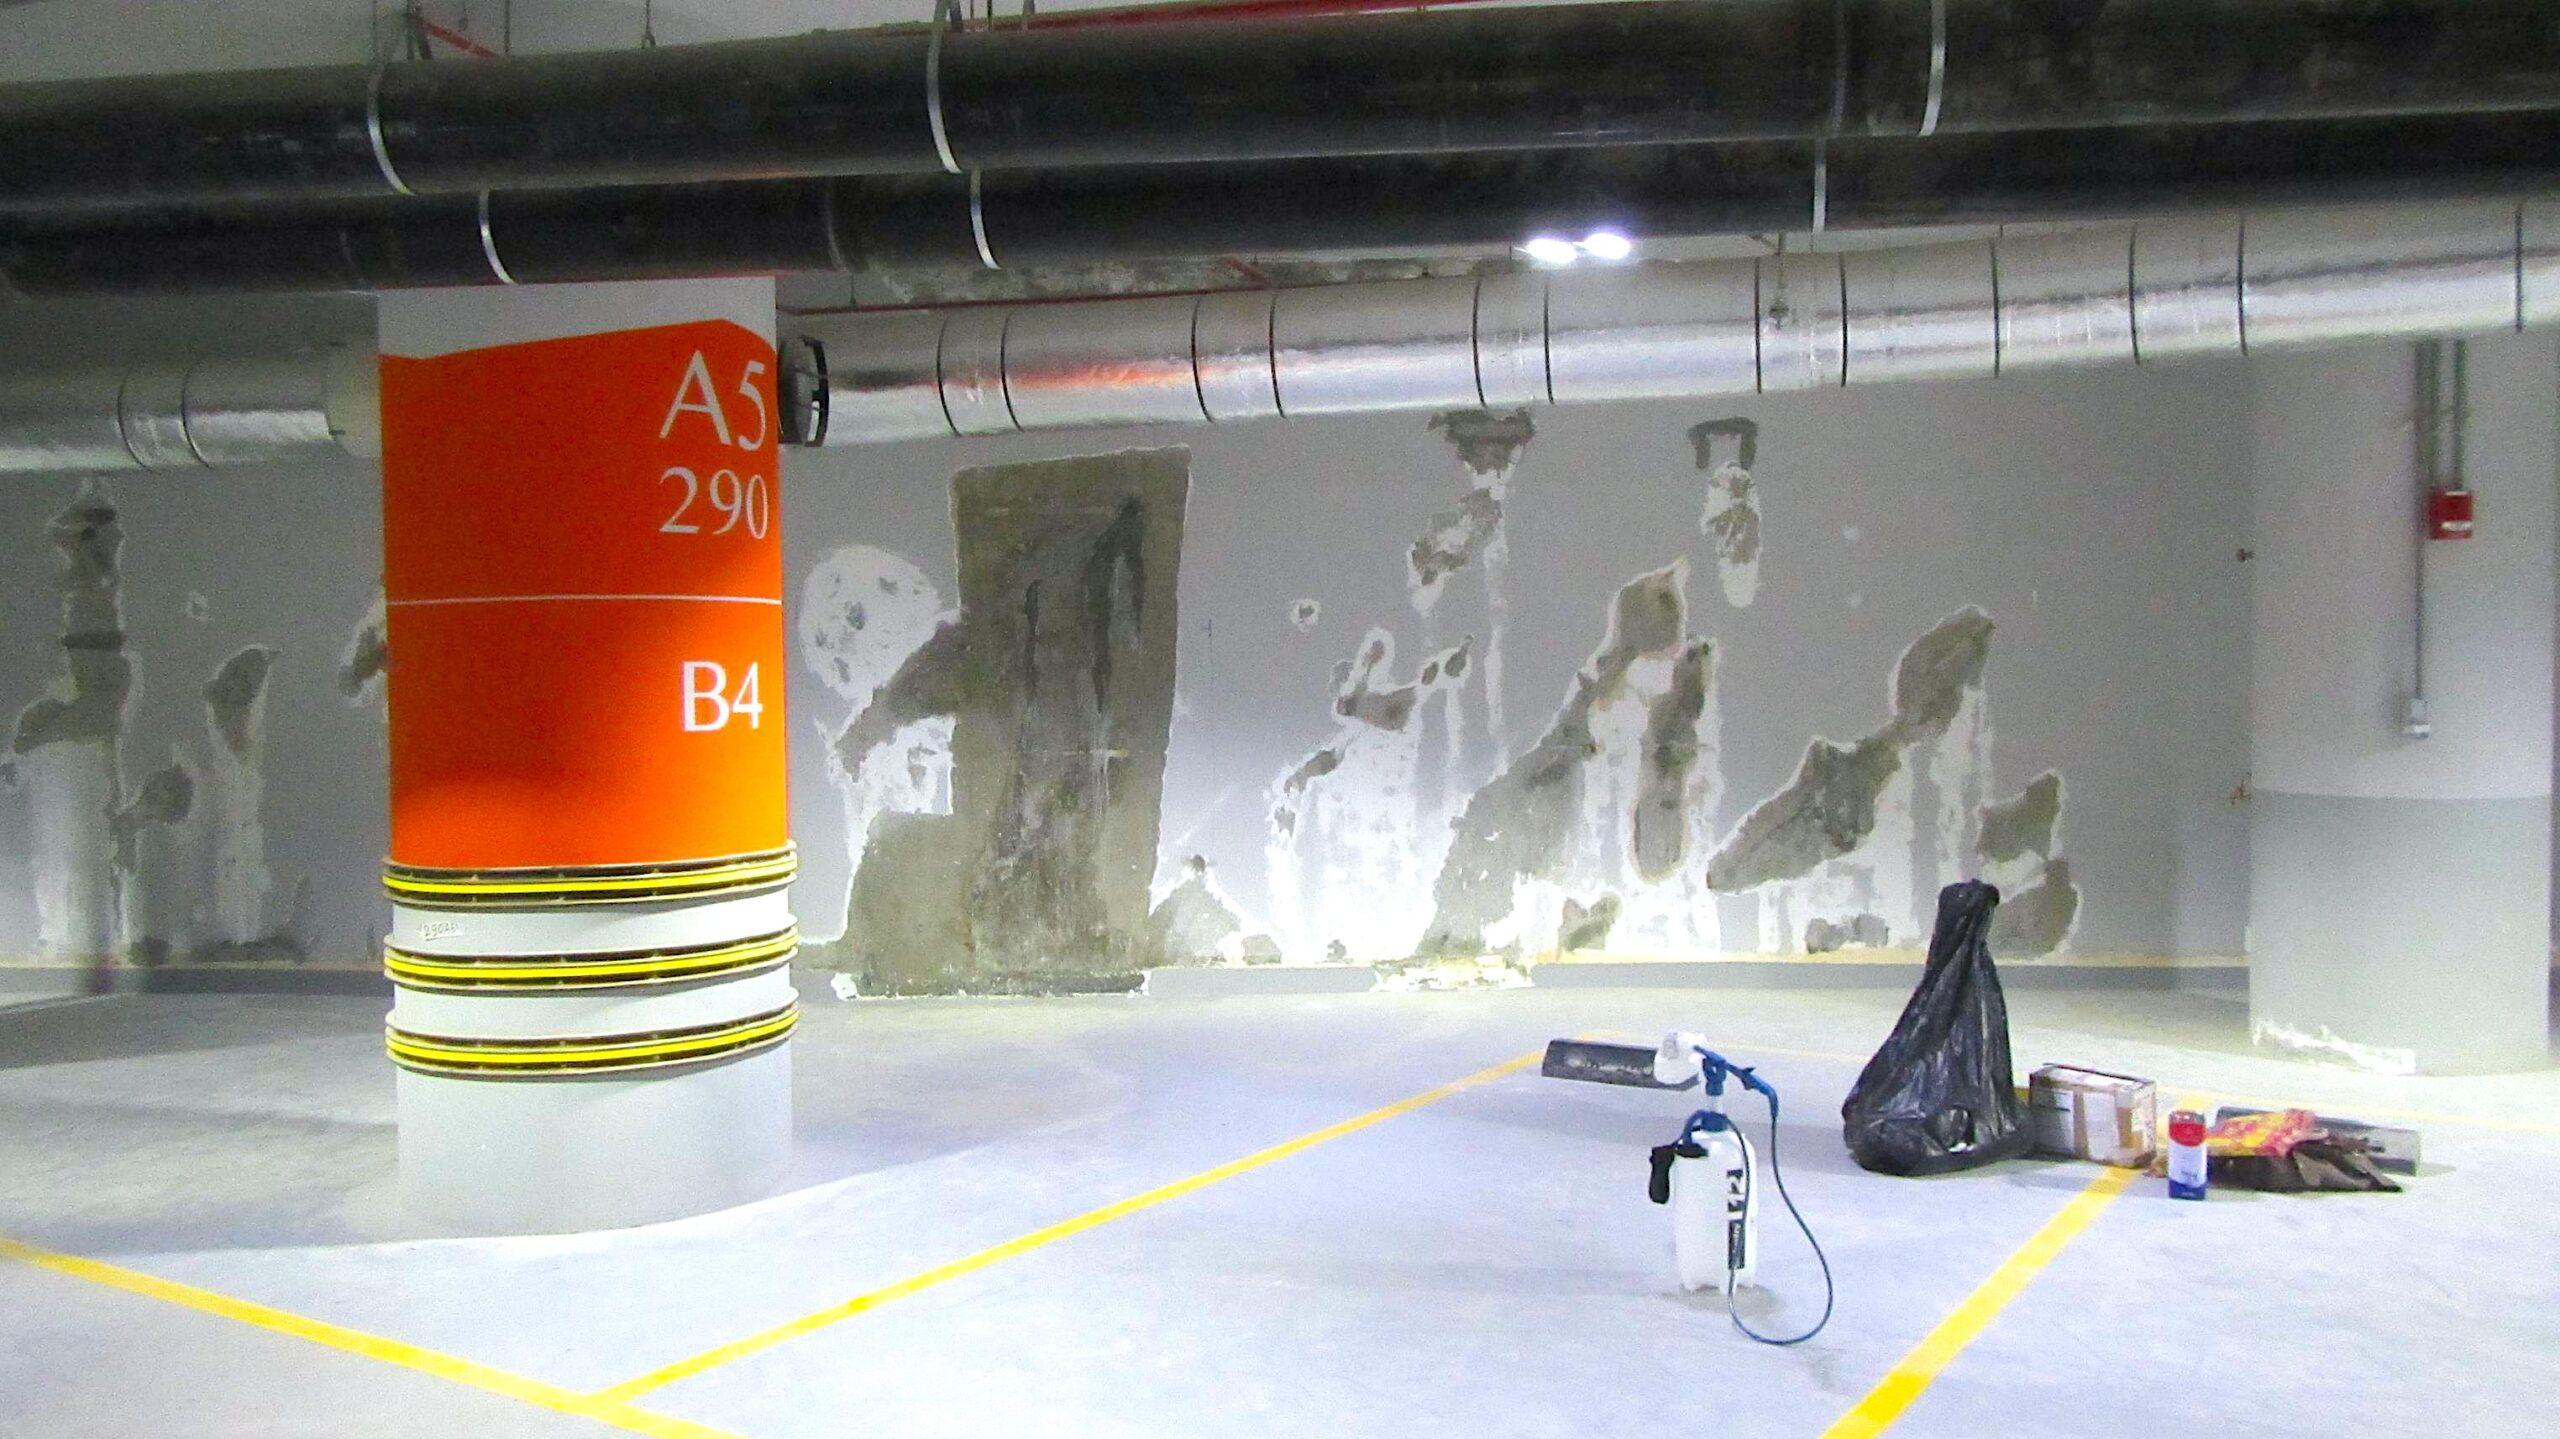 komsol professionelle Reparatur Loesungen Grossbauprojekte Grossprojekte Innerseal Versiegelung